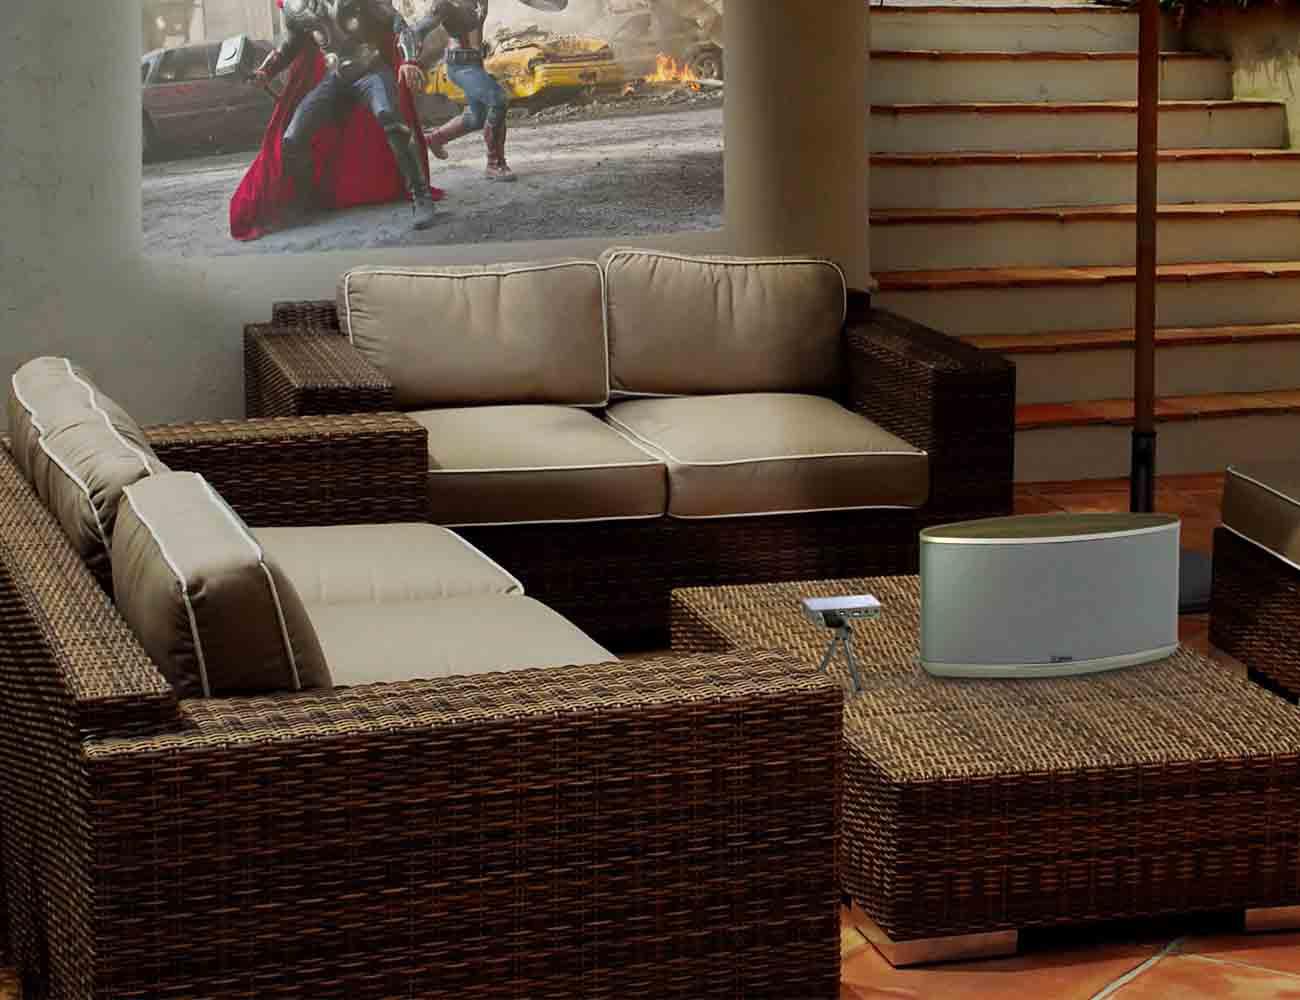 AxiomAir+%26%238211%3B+Powerful+Wireless+Wi-Fi+Speaker